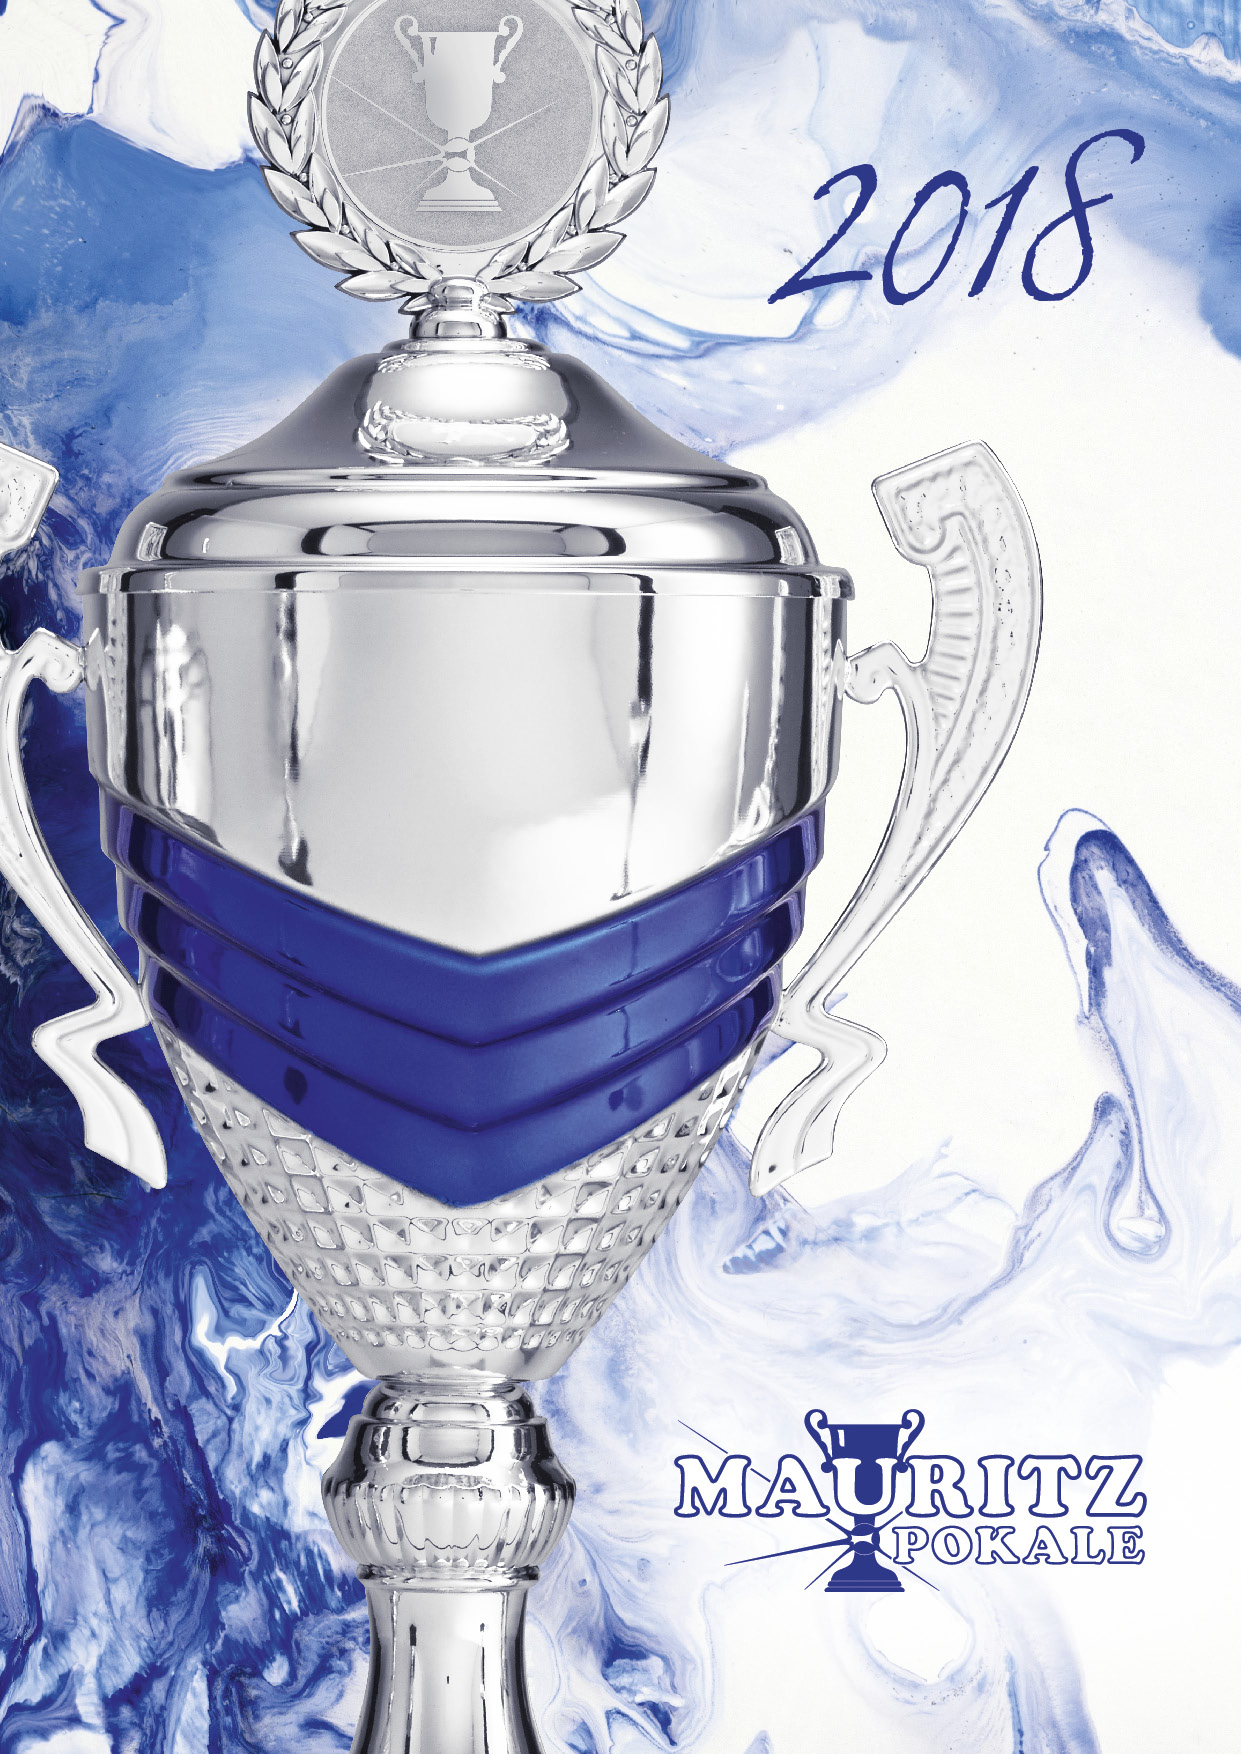 mauritz-katalog-cover-u1-2018